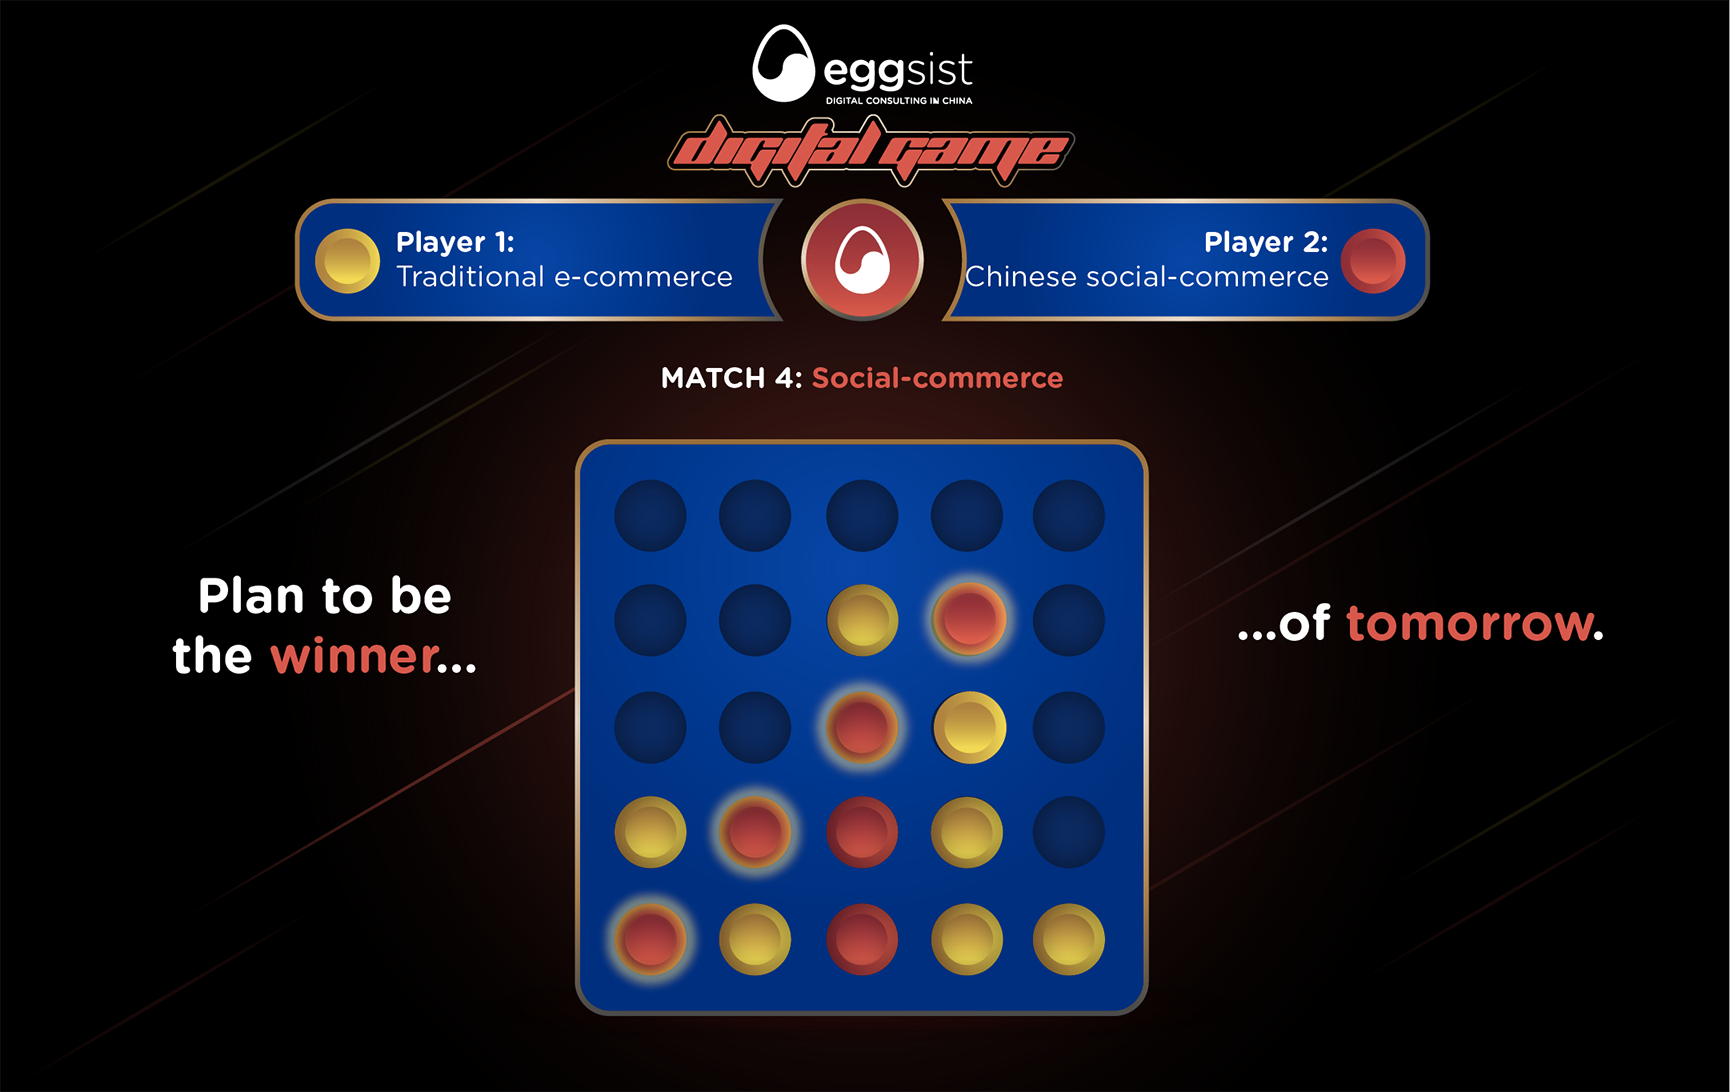 EGGsist-_-China-social-commerce.png